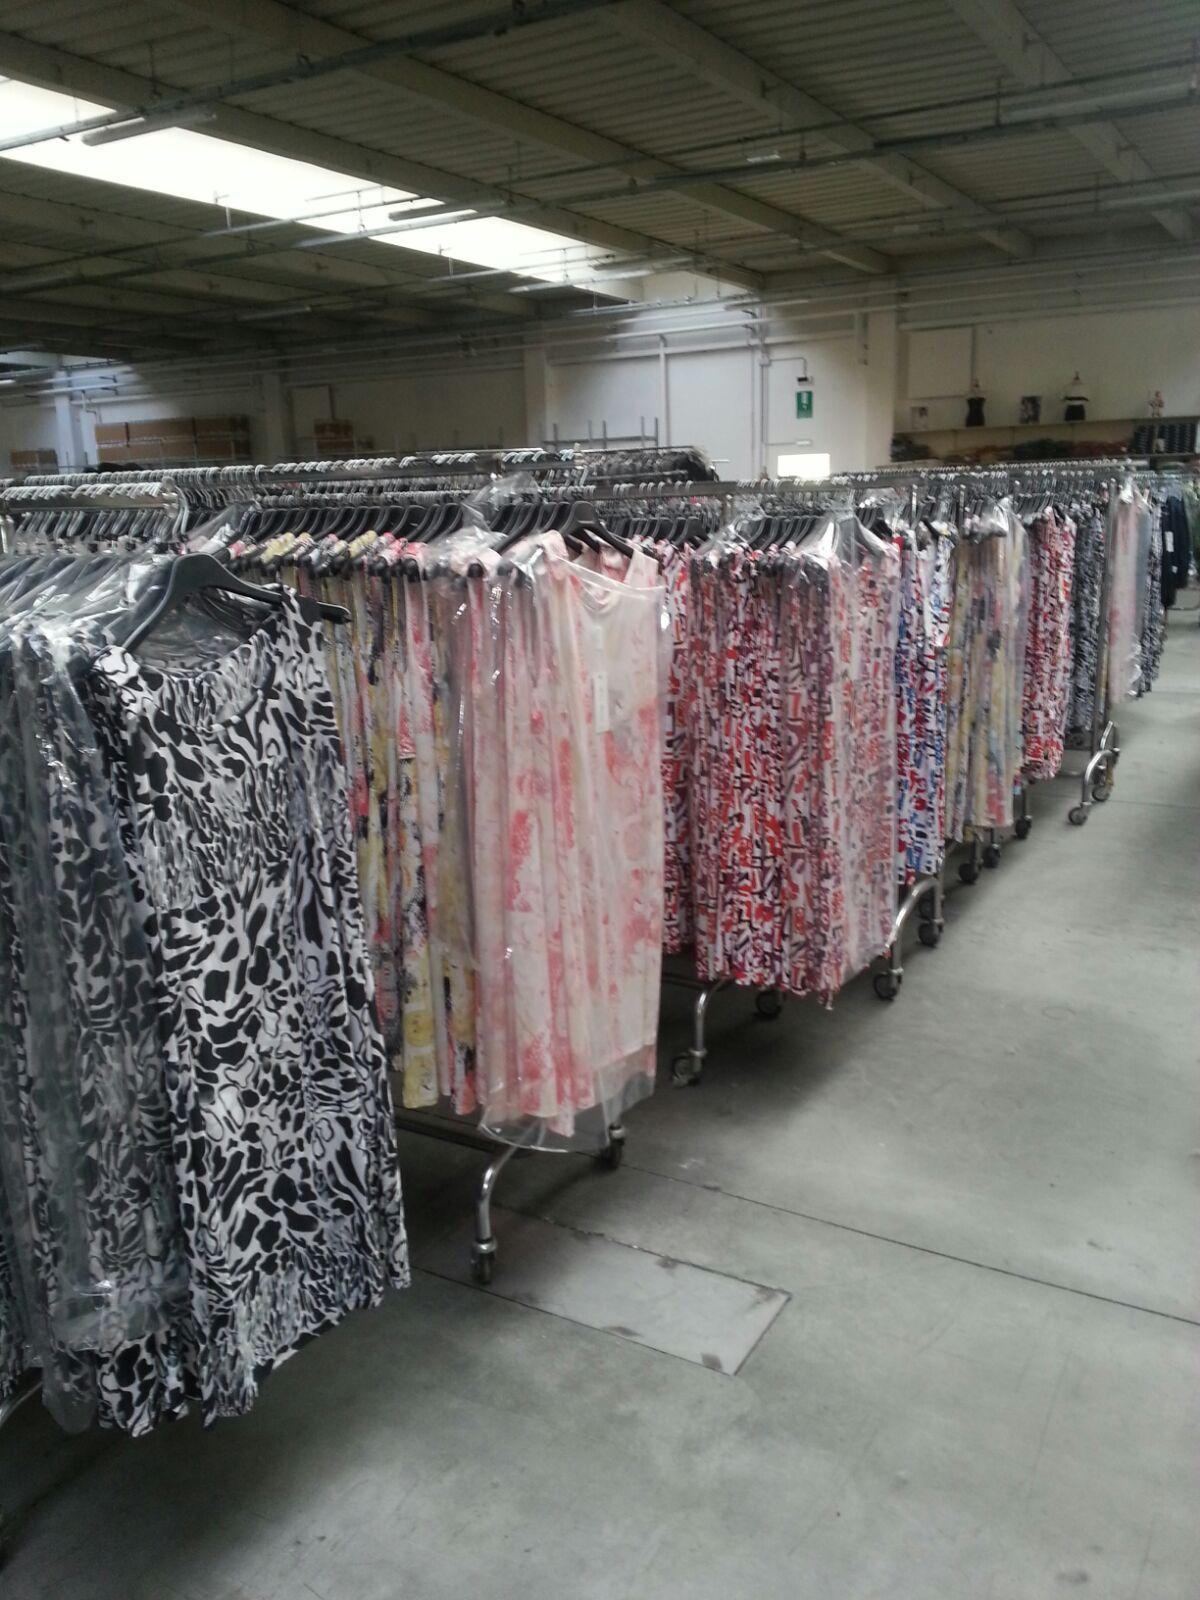 look for meet speical offer Donna Vendita Abbigliamento Online Stock In Estivo 01f5Pqw